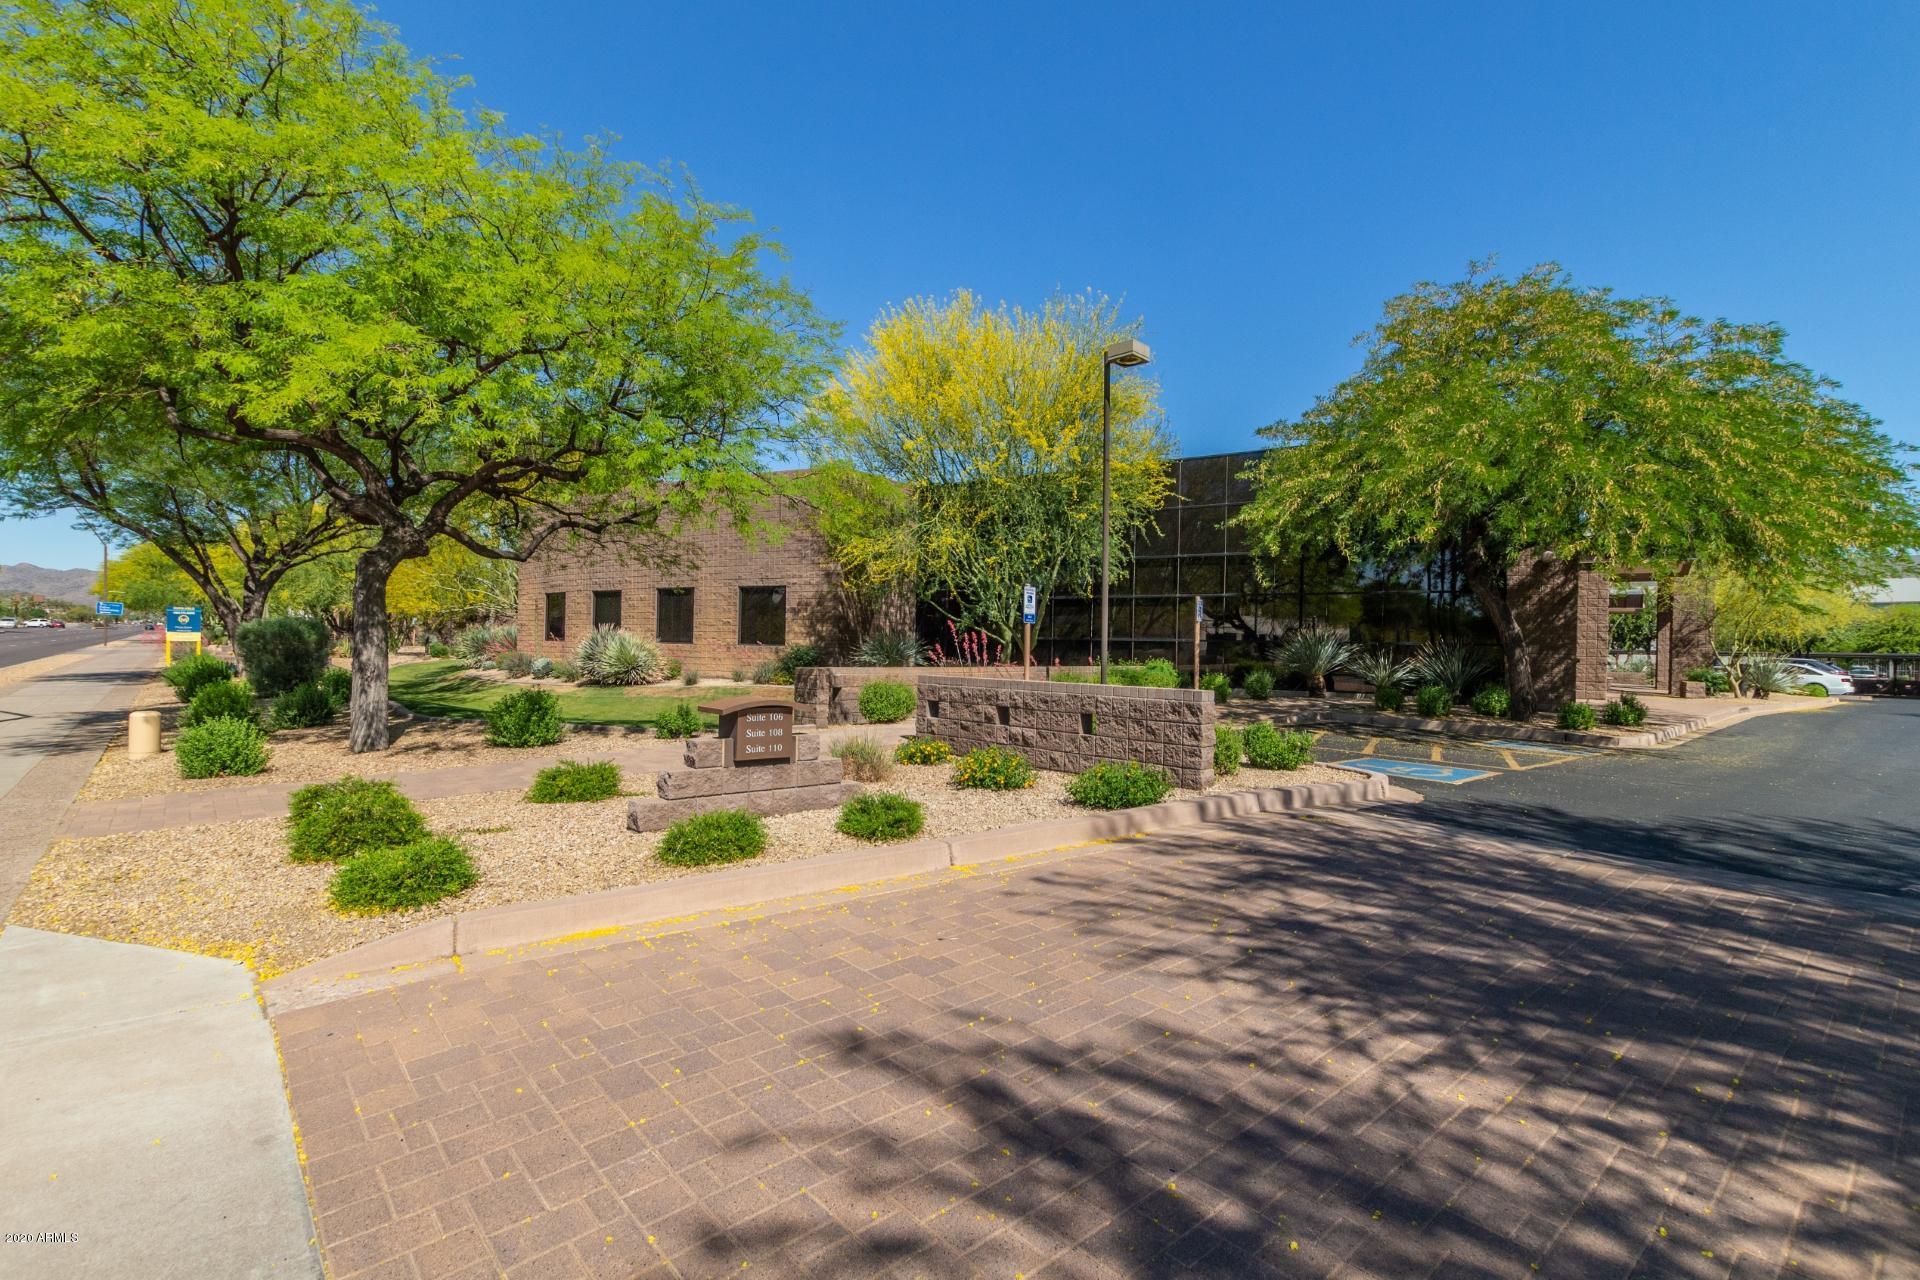 Photo of 850 & 858 W ELLIOT Road, Tempe, AZ 85284